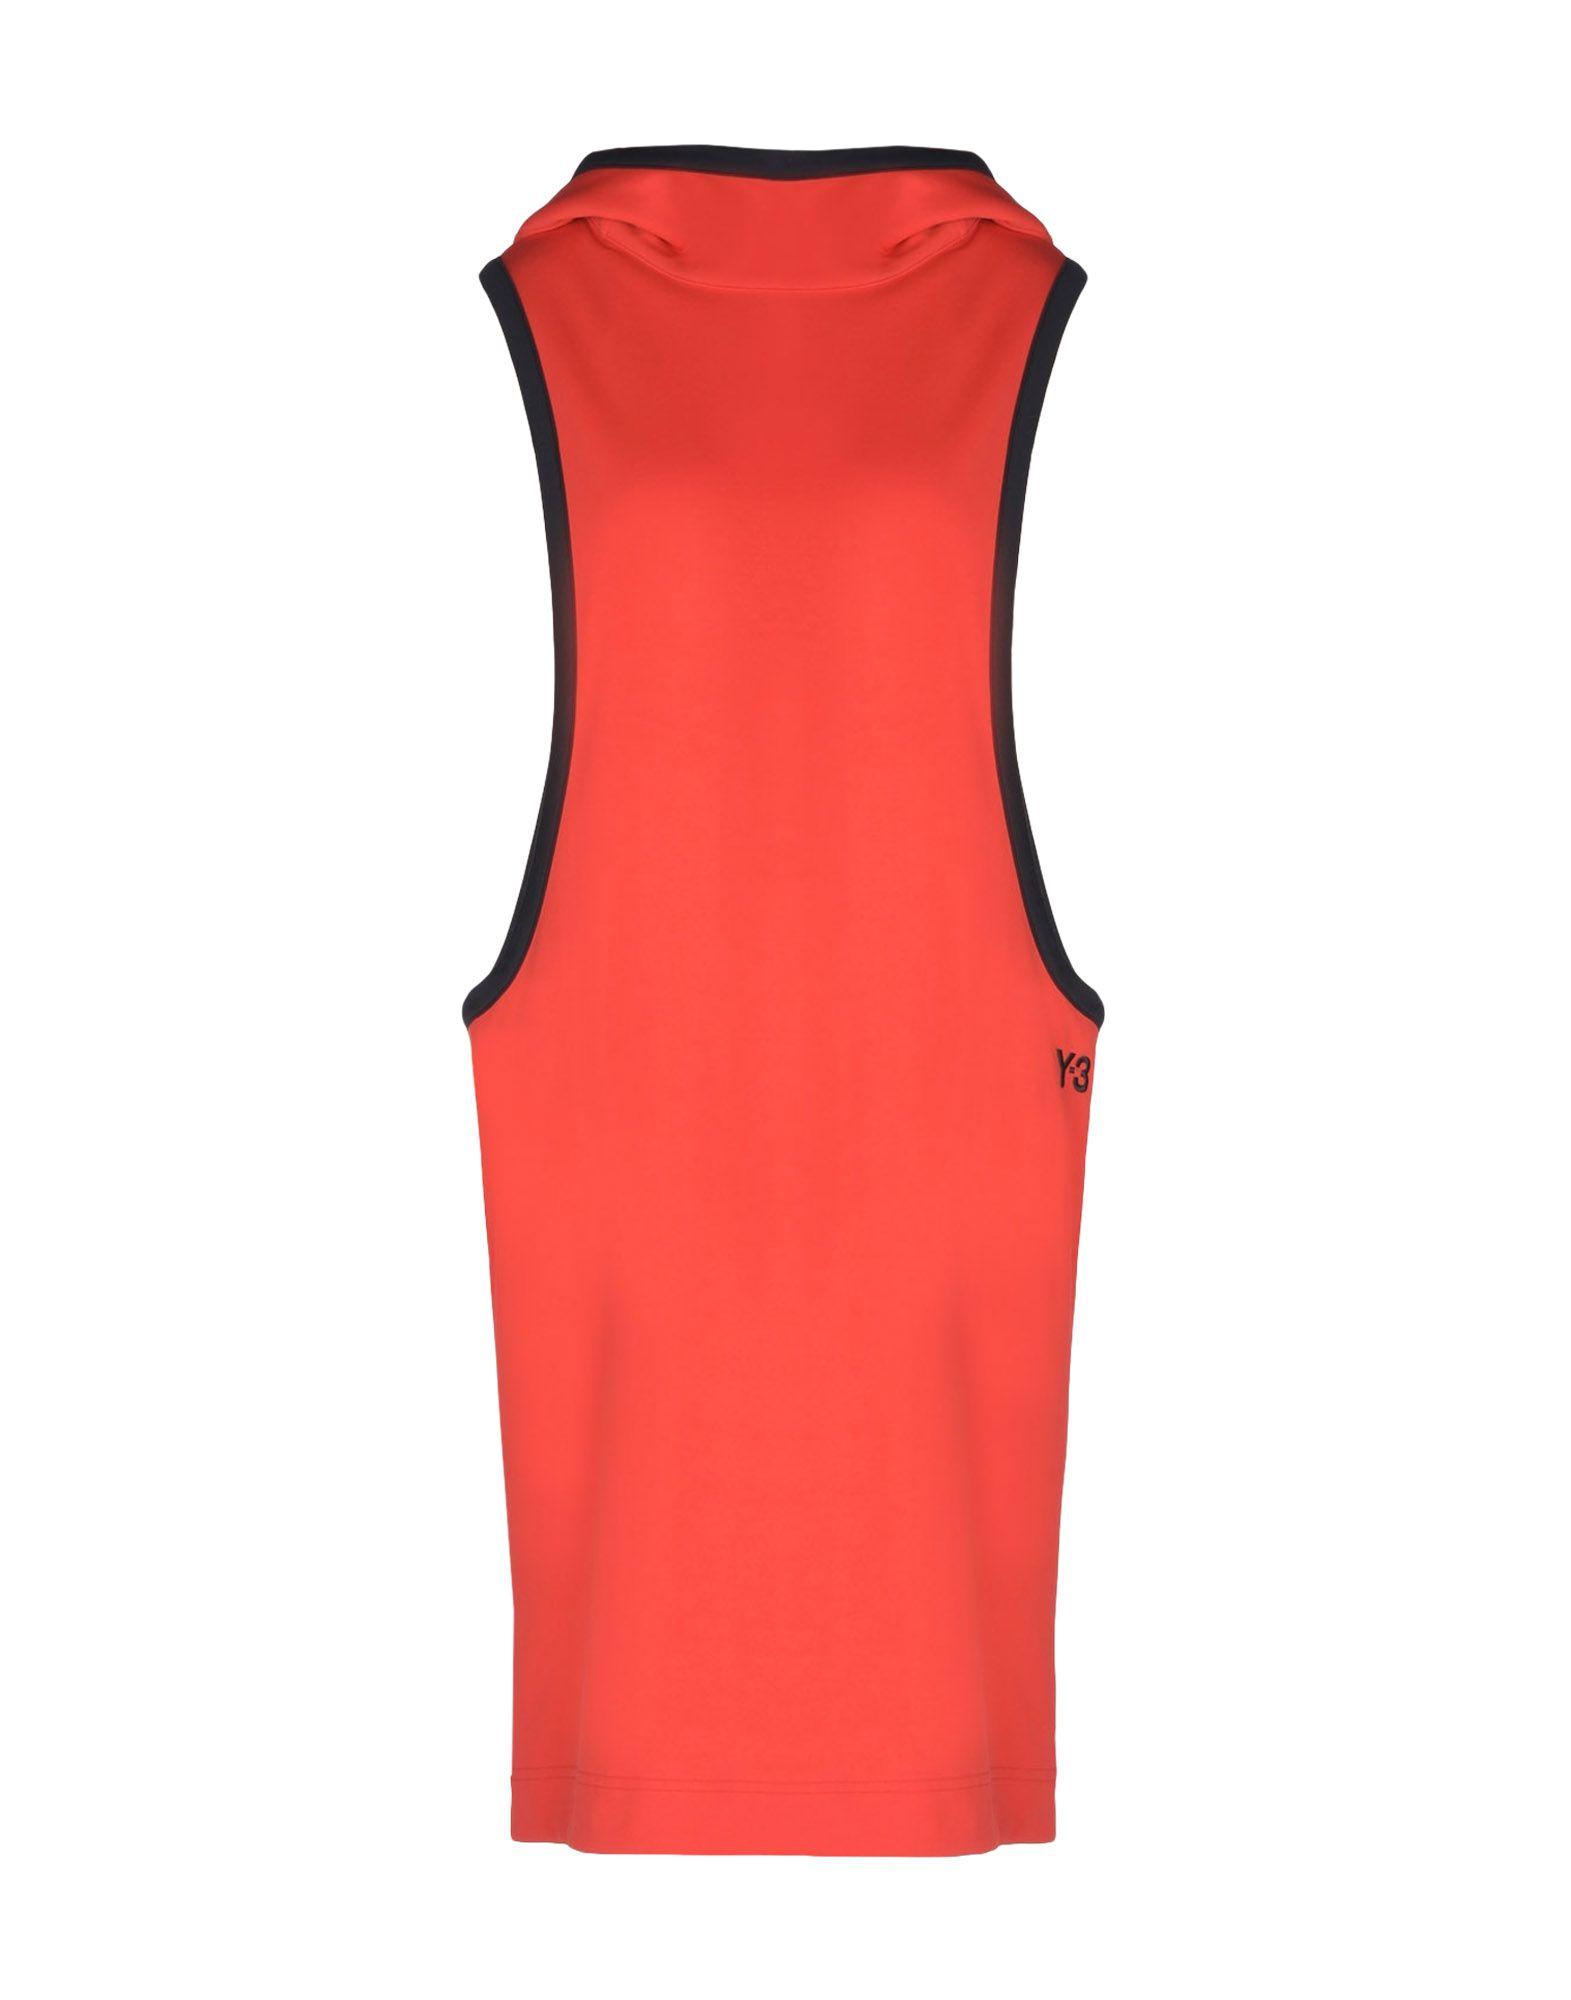 Y-3 CORE TRACK DRESS DRESSES & SKIRTS woman Y-3 adidas